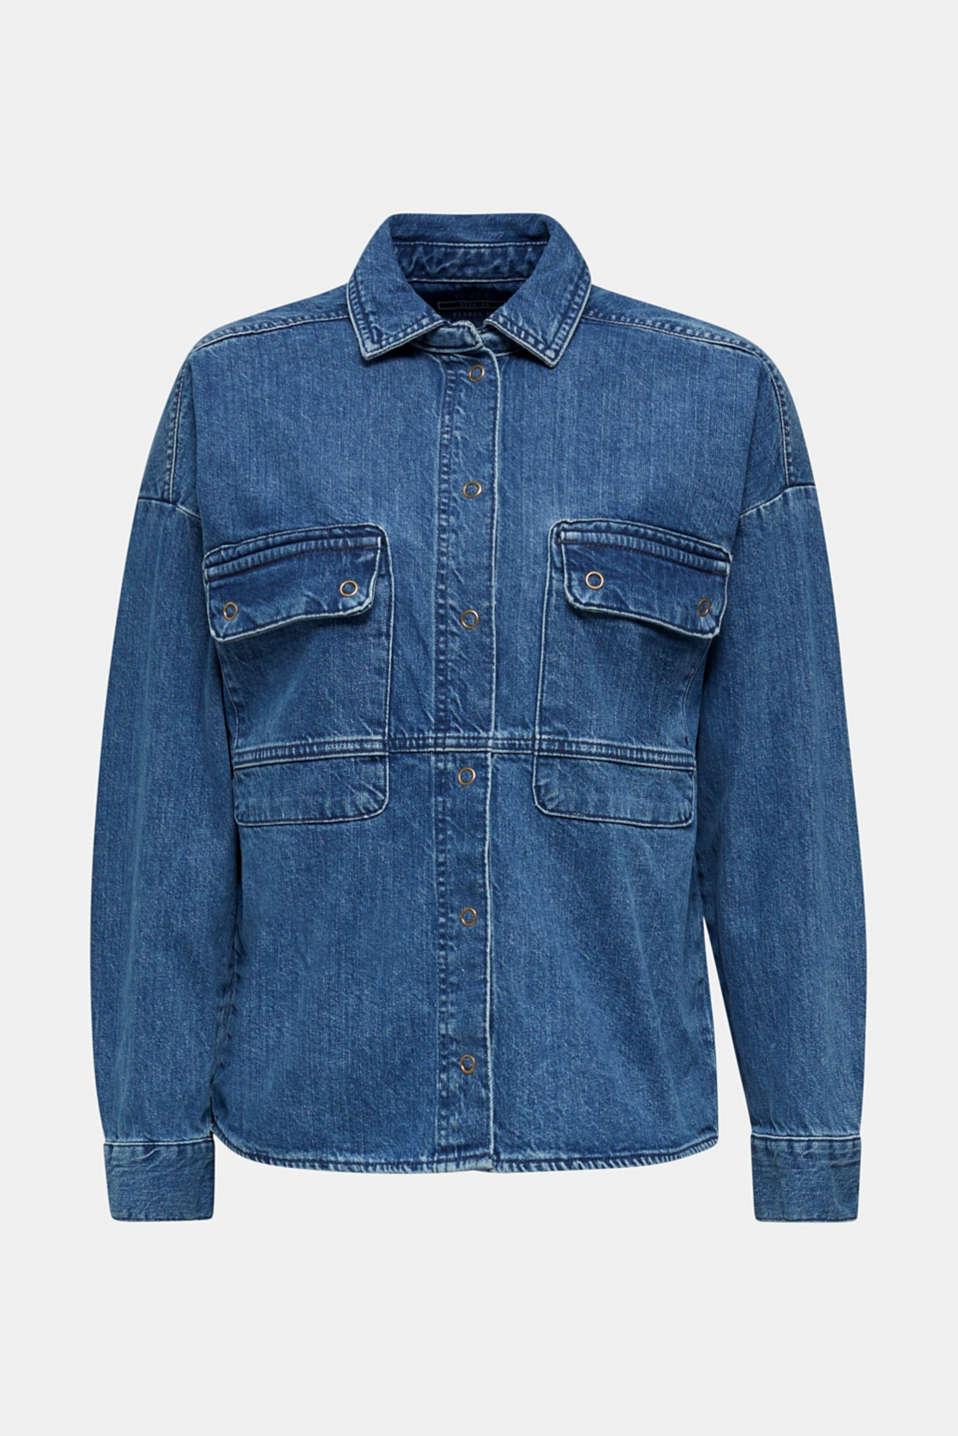 Denim shirt jacket, 100% cotton, BLUE MEDIUM WASH, detail image number 5